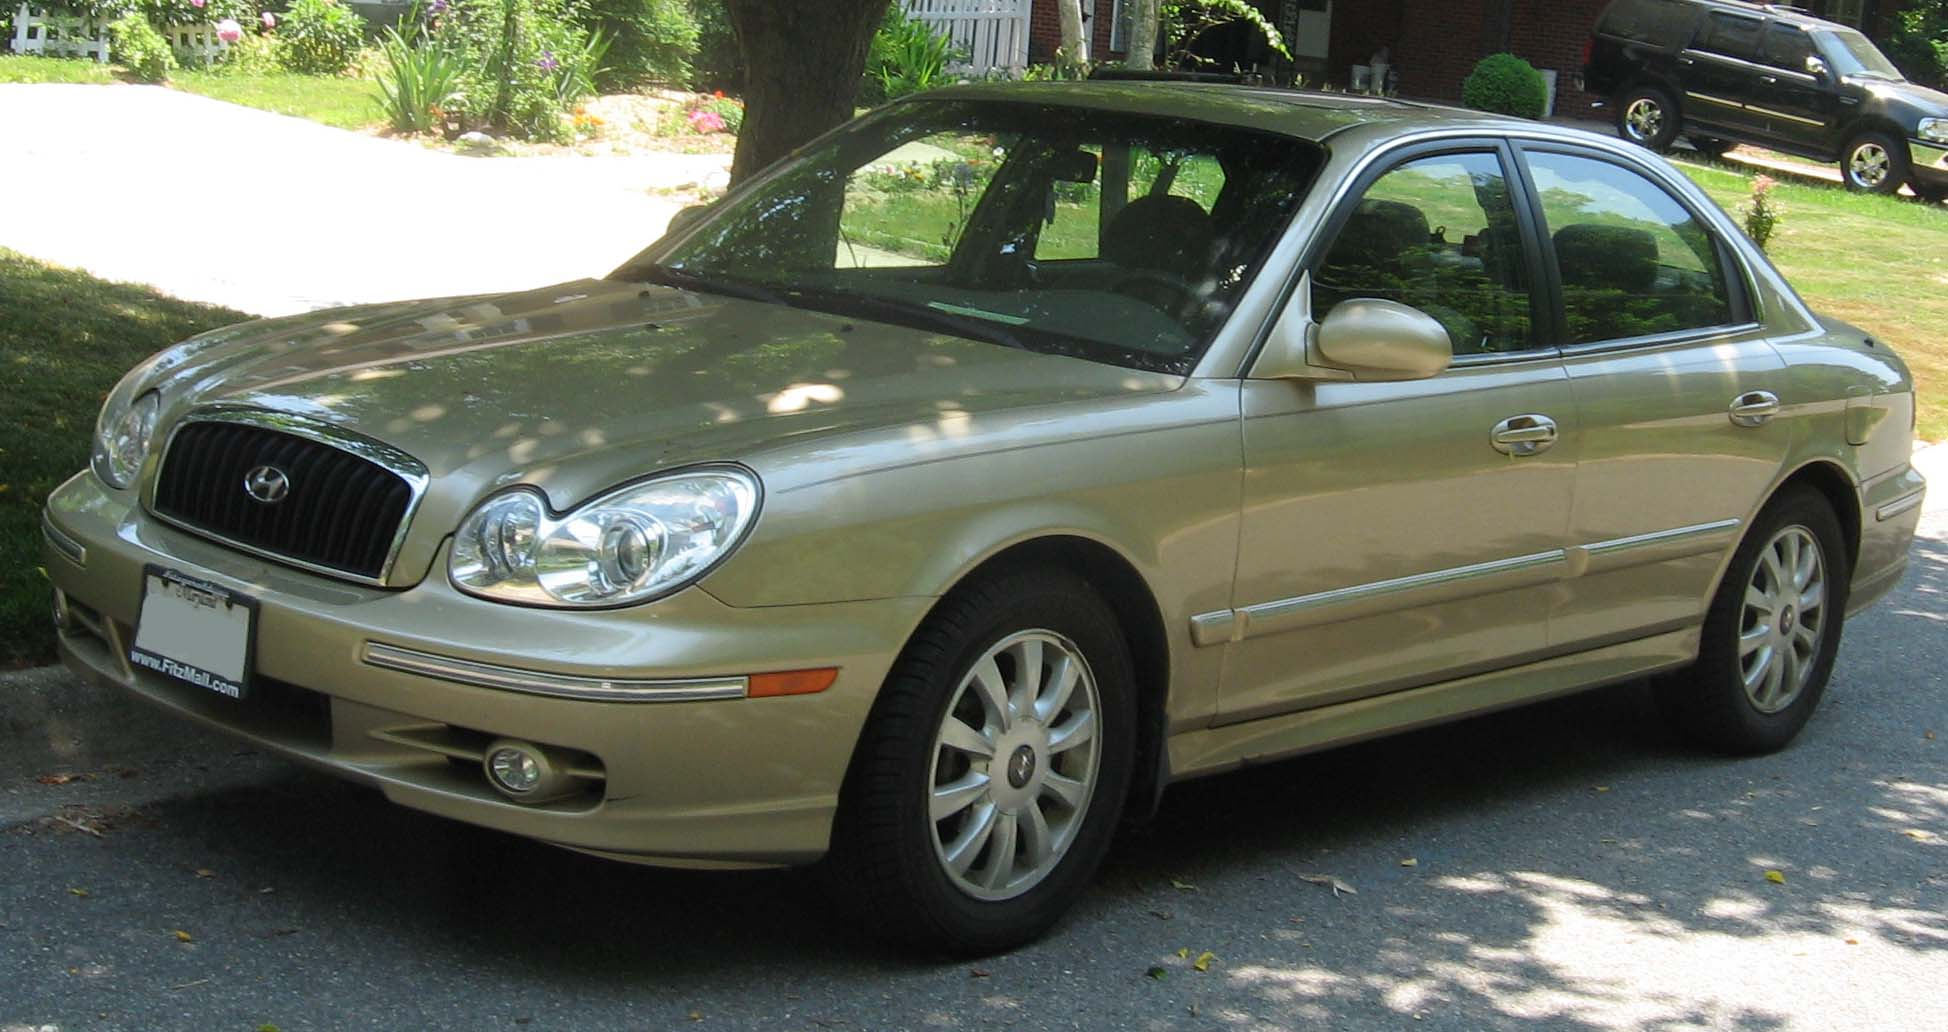 File 02 05 Hyundai Sonata Gls V6 Jpg Wikimedia Commons